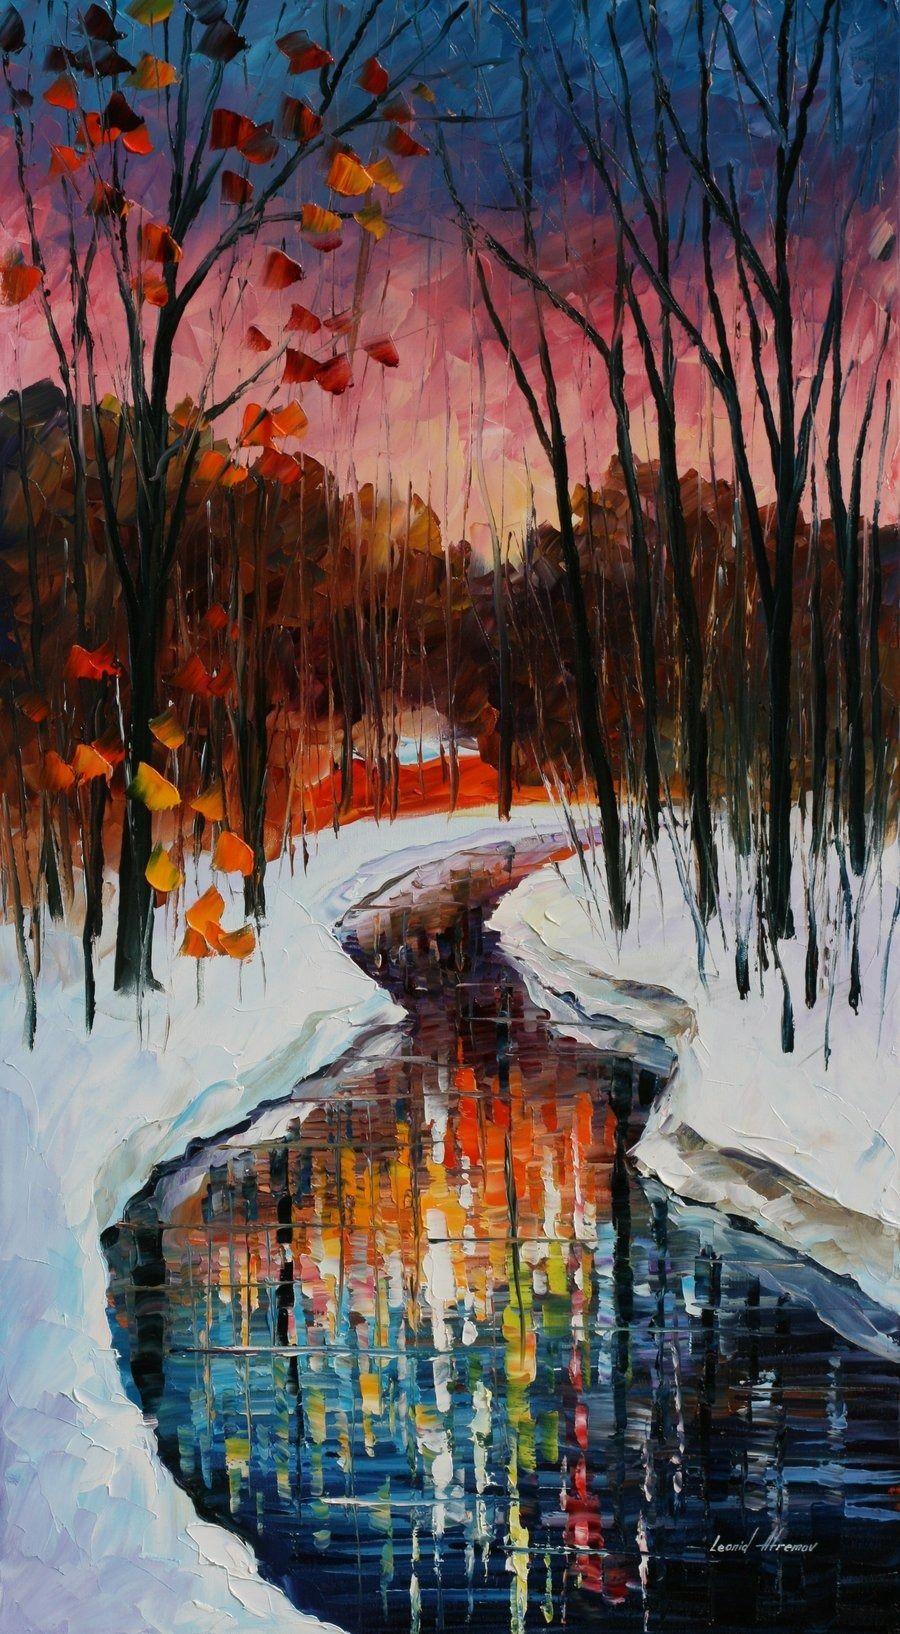 Leonid Afremov Winter Stream Natural Oil On 100 Pure Cotton Canvas Oil Painting Landscape Fine Art Artwork